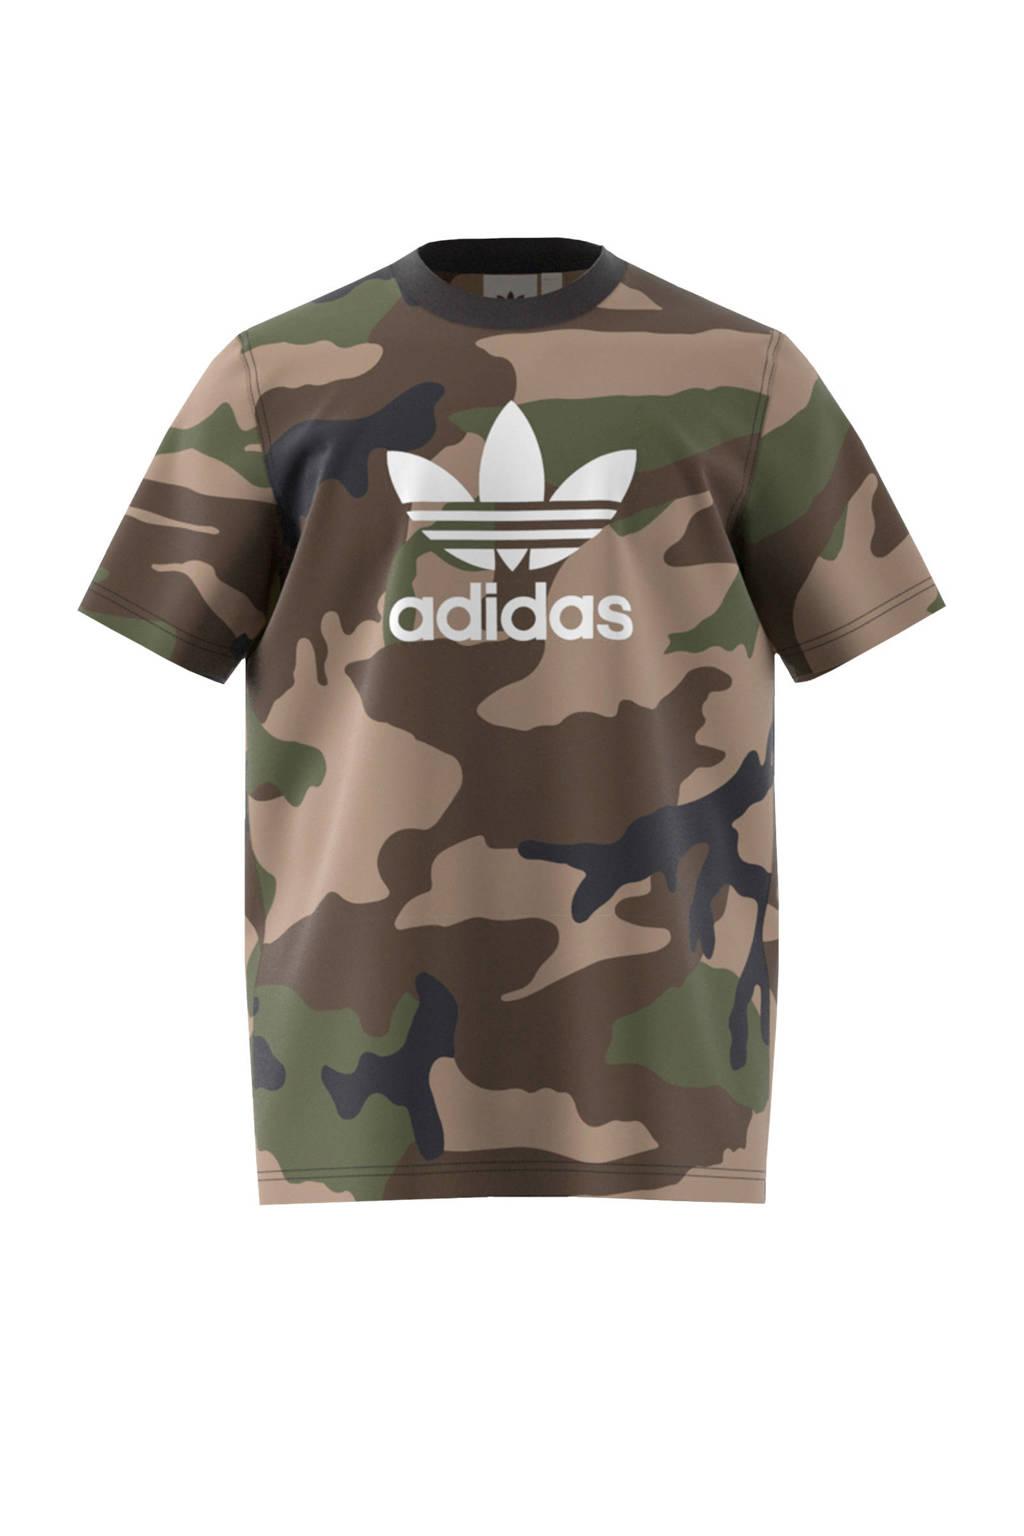 adidas originals   T-shirt, Groen camouflage